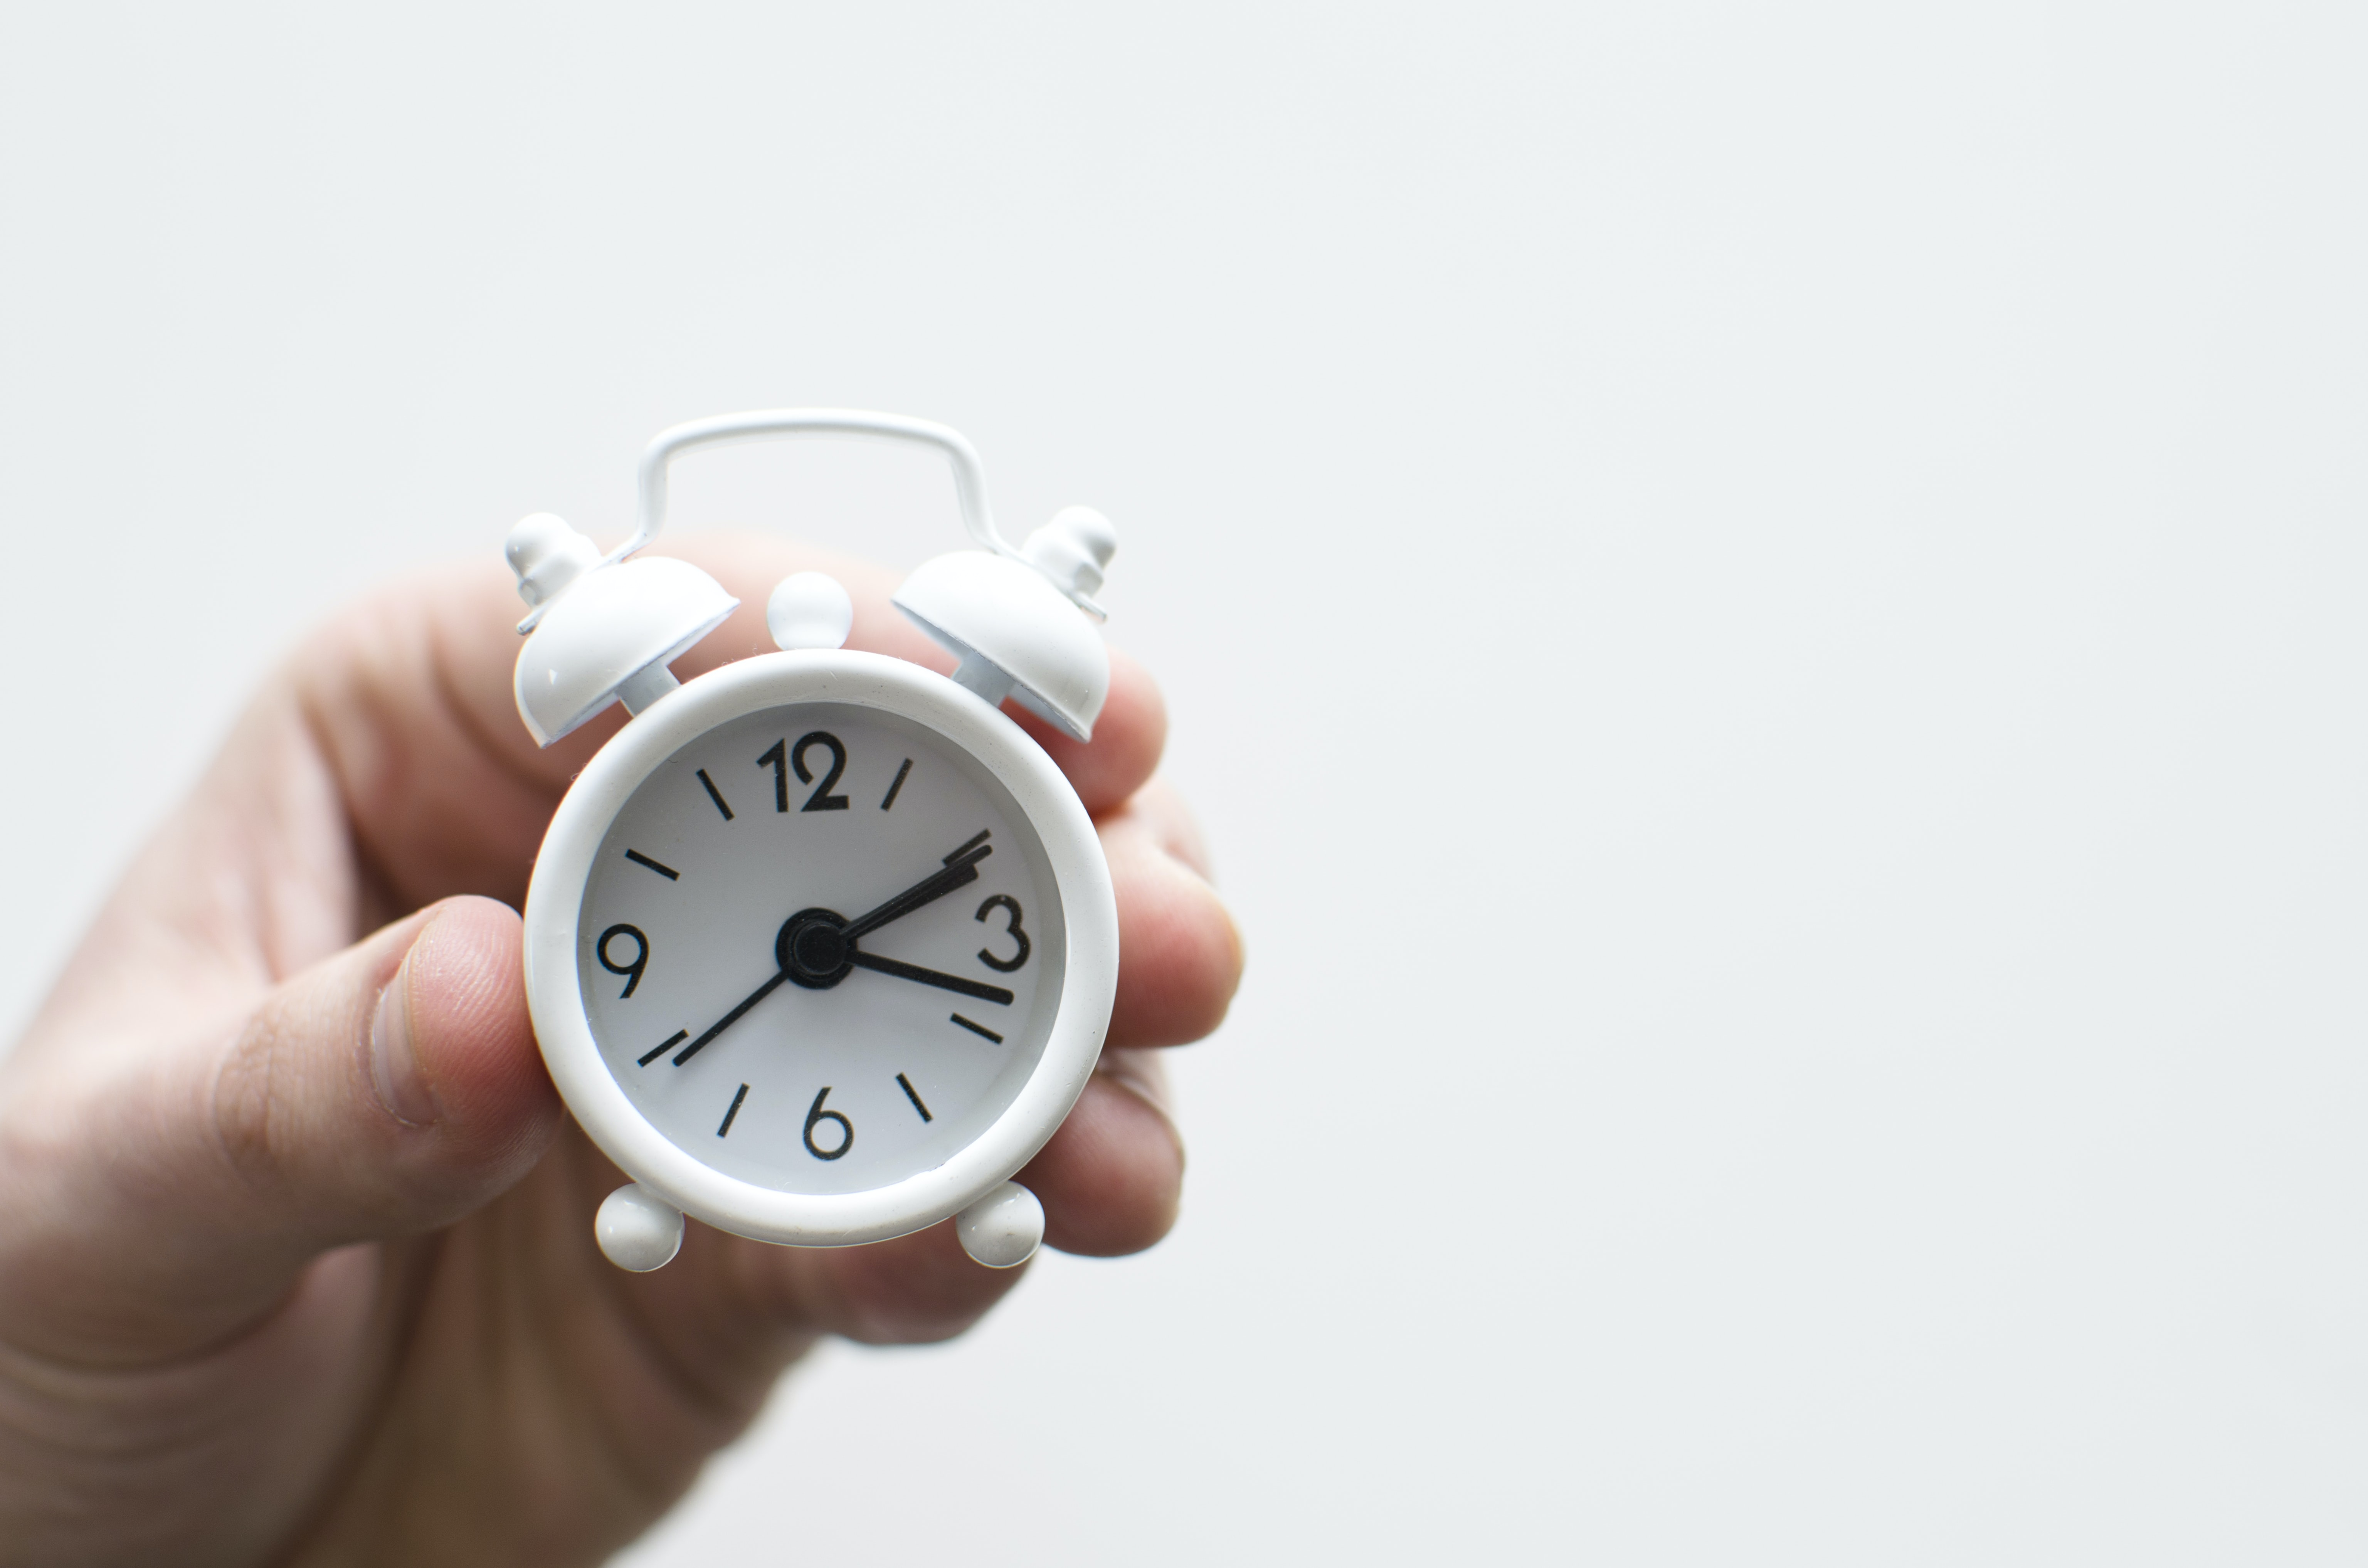 A hand holding a tiny white alarm clock